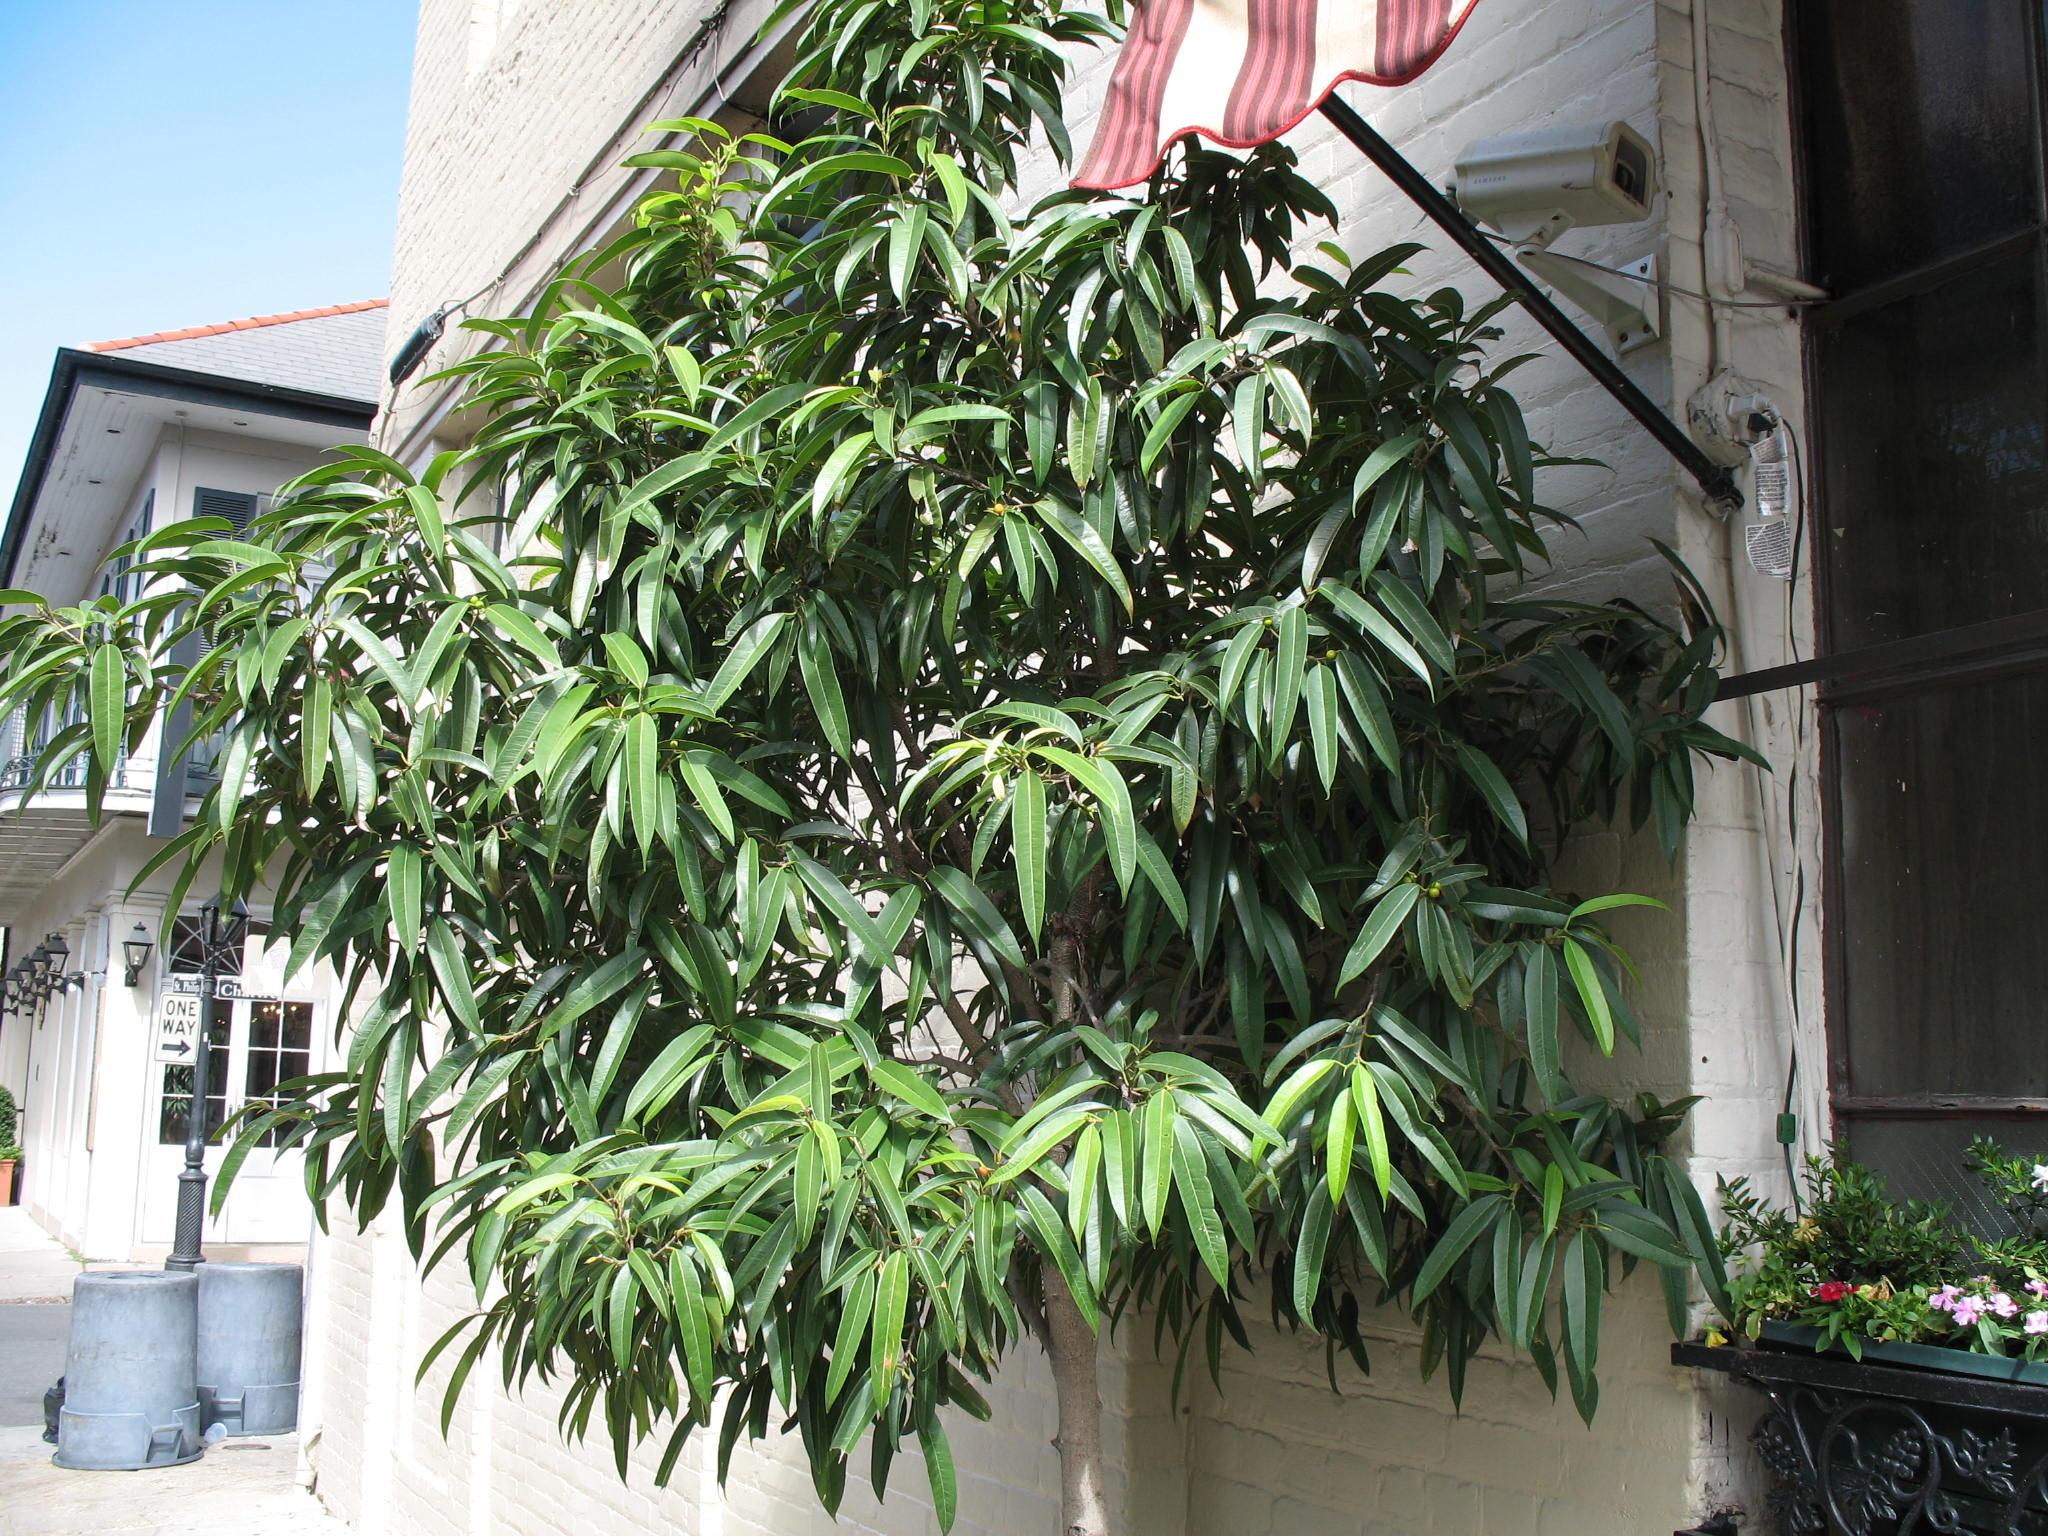 Ficus binnendijkii 'Alii' / Ficus binnendijkii 'Alii'